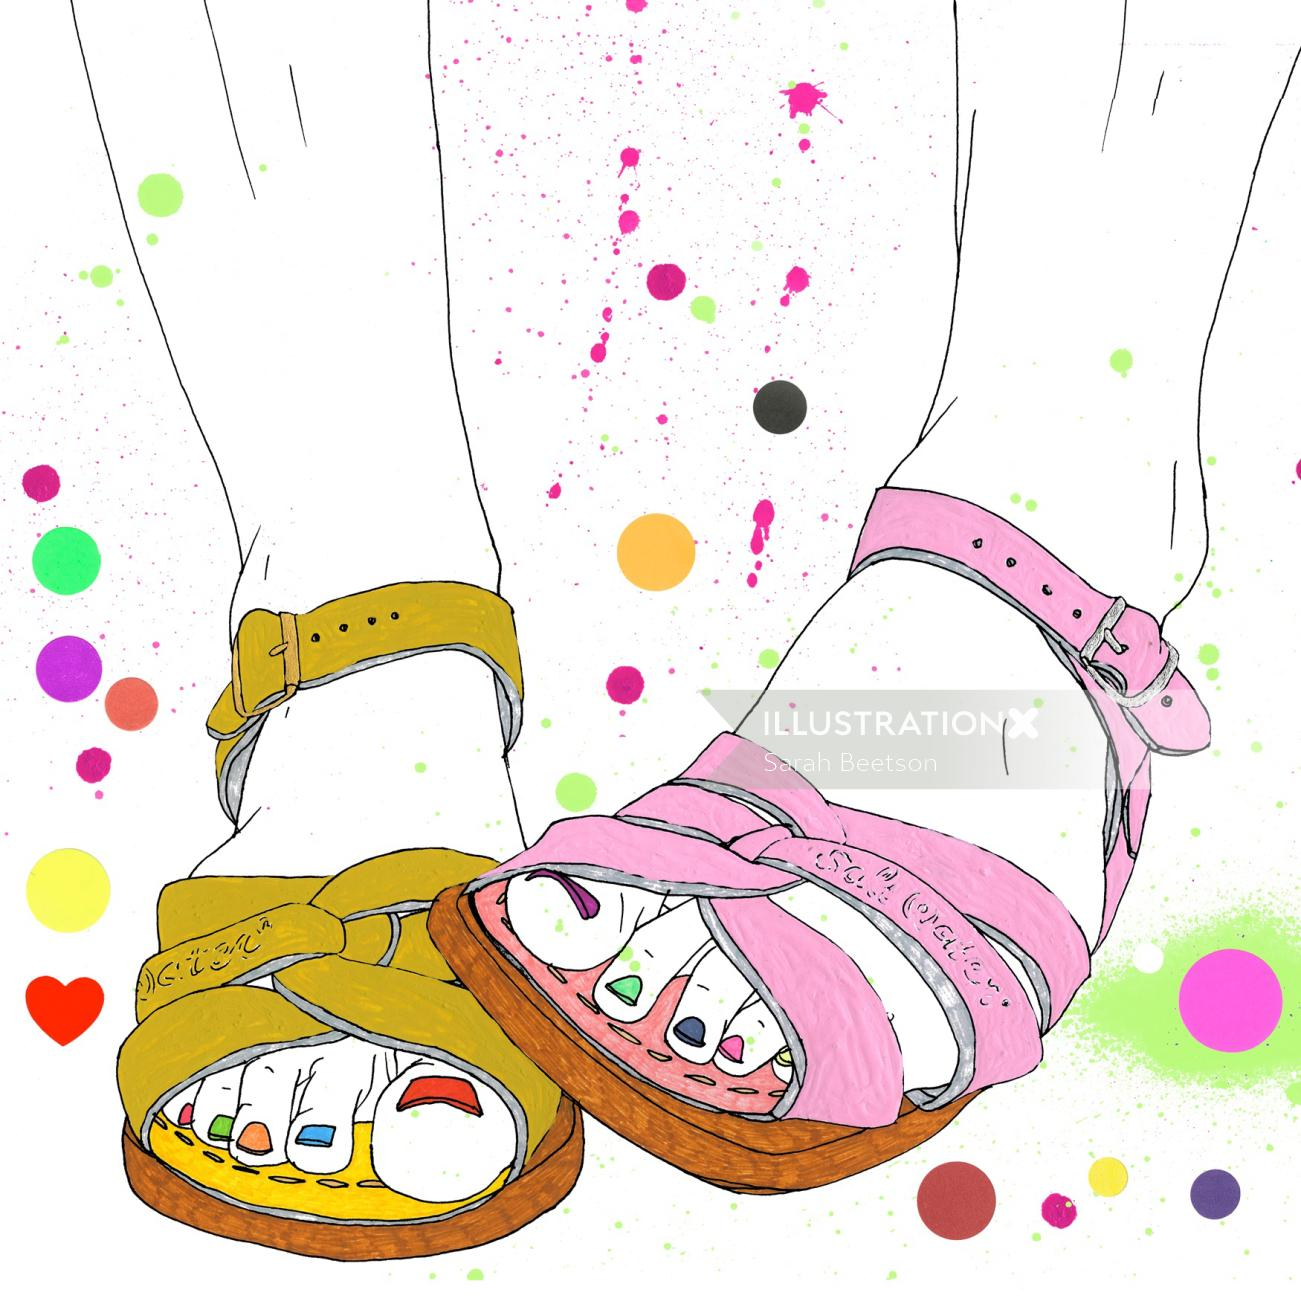 Fashion illustration of different color sandals